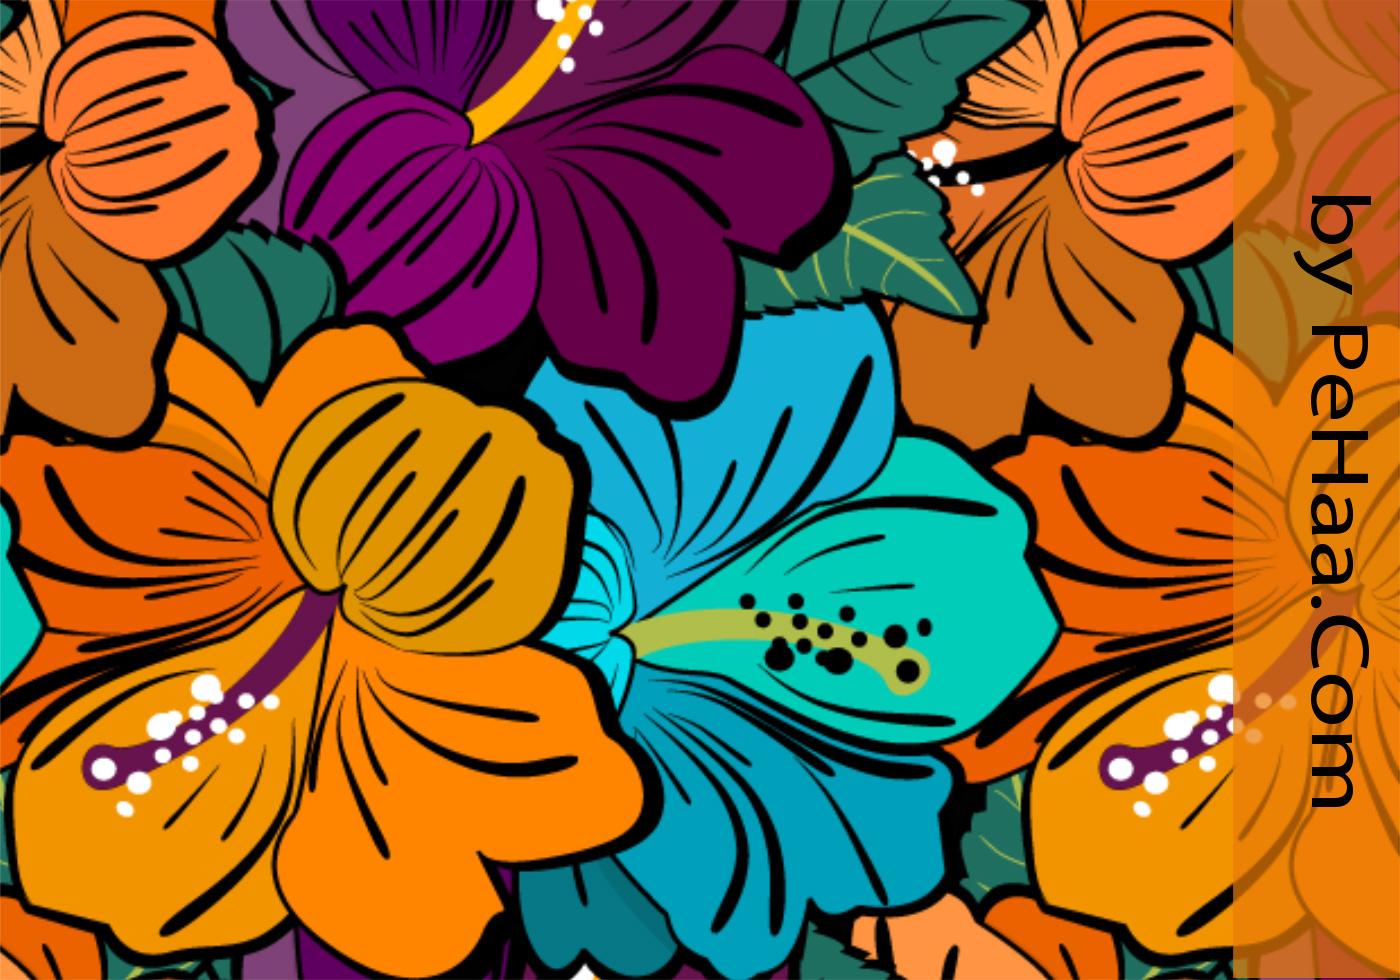 Very-flowery-floral-pattern-photoshop-patterns